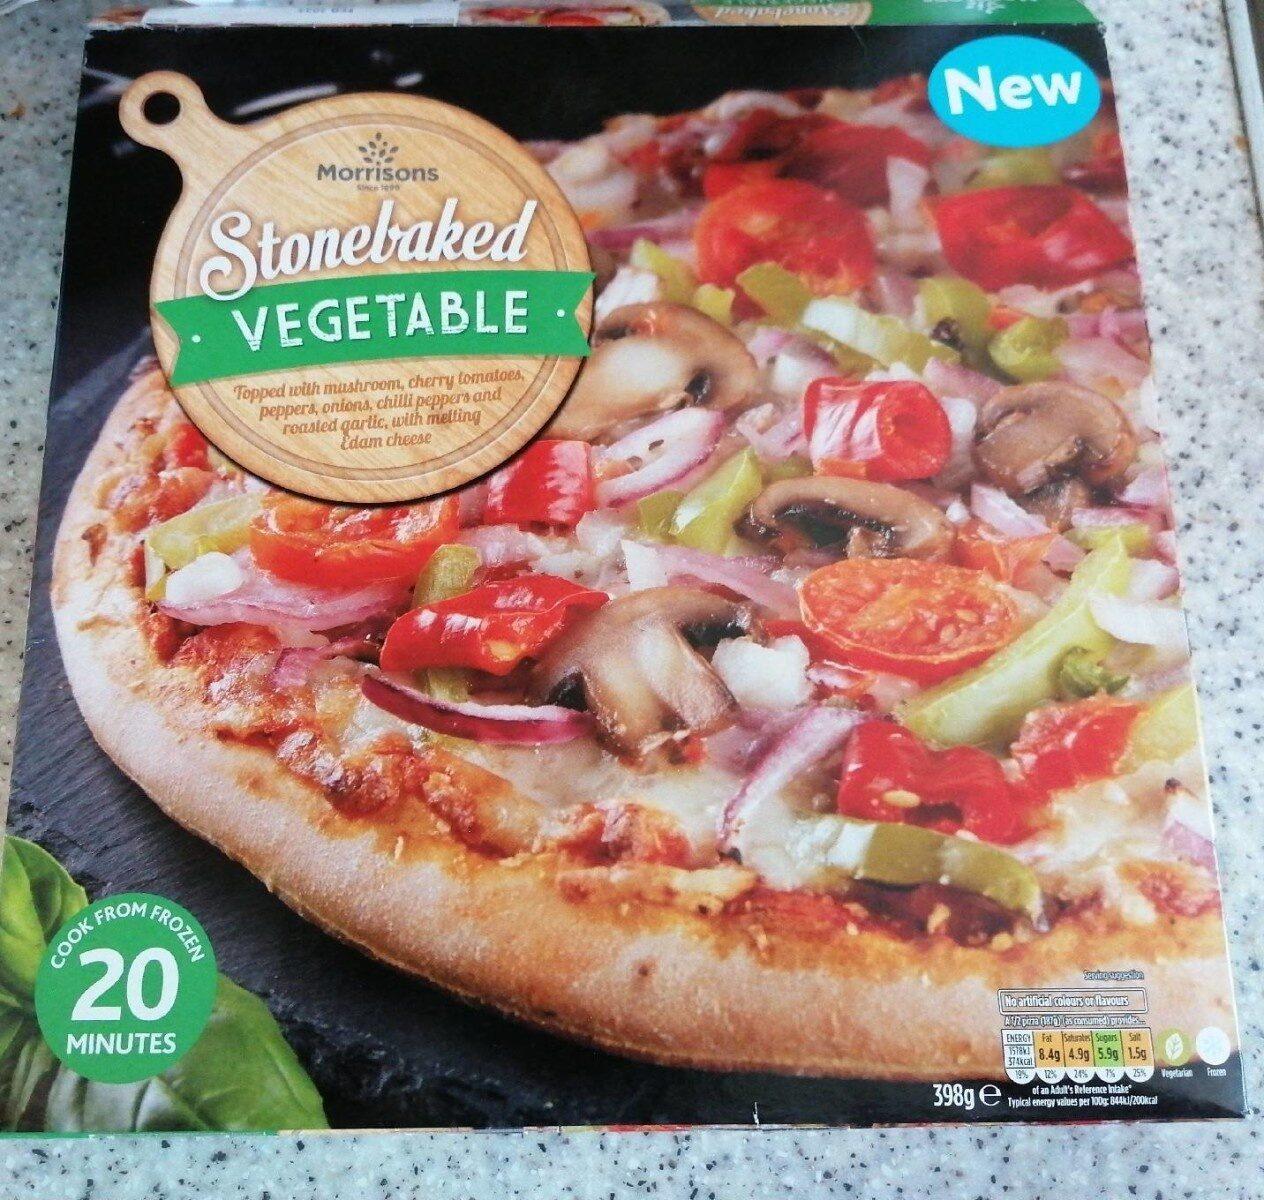 Stonebaked vegetable pizza - Prodotto - en